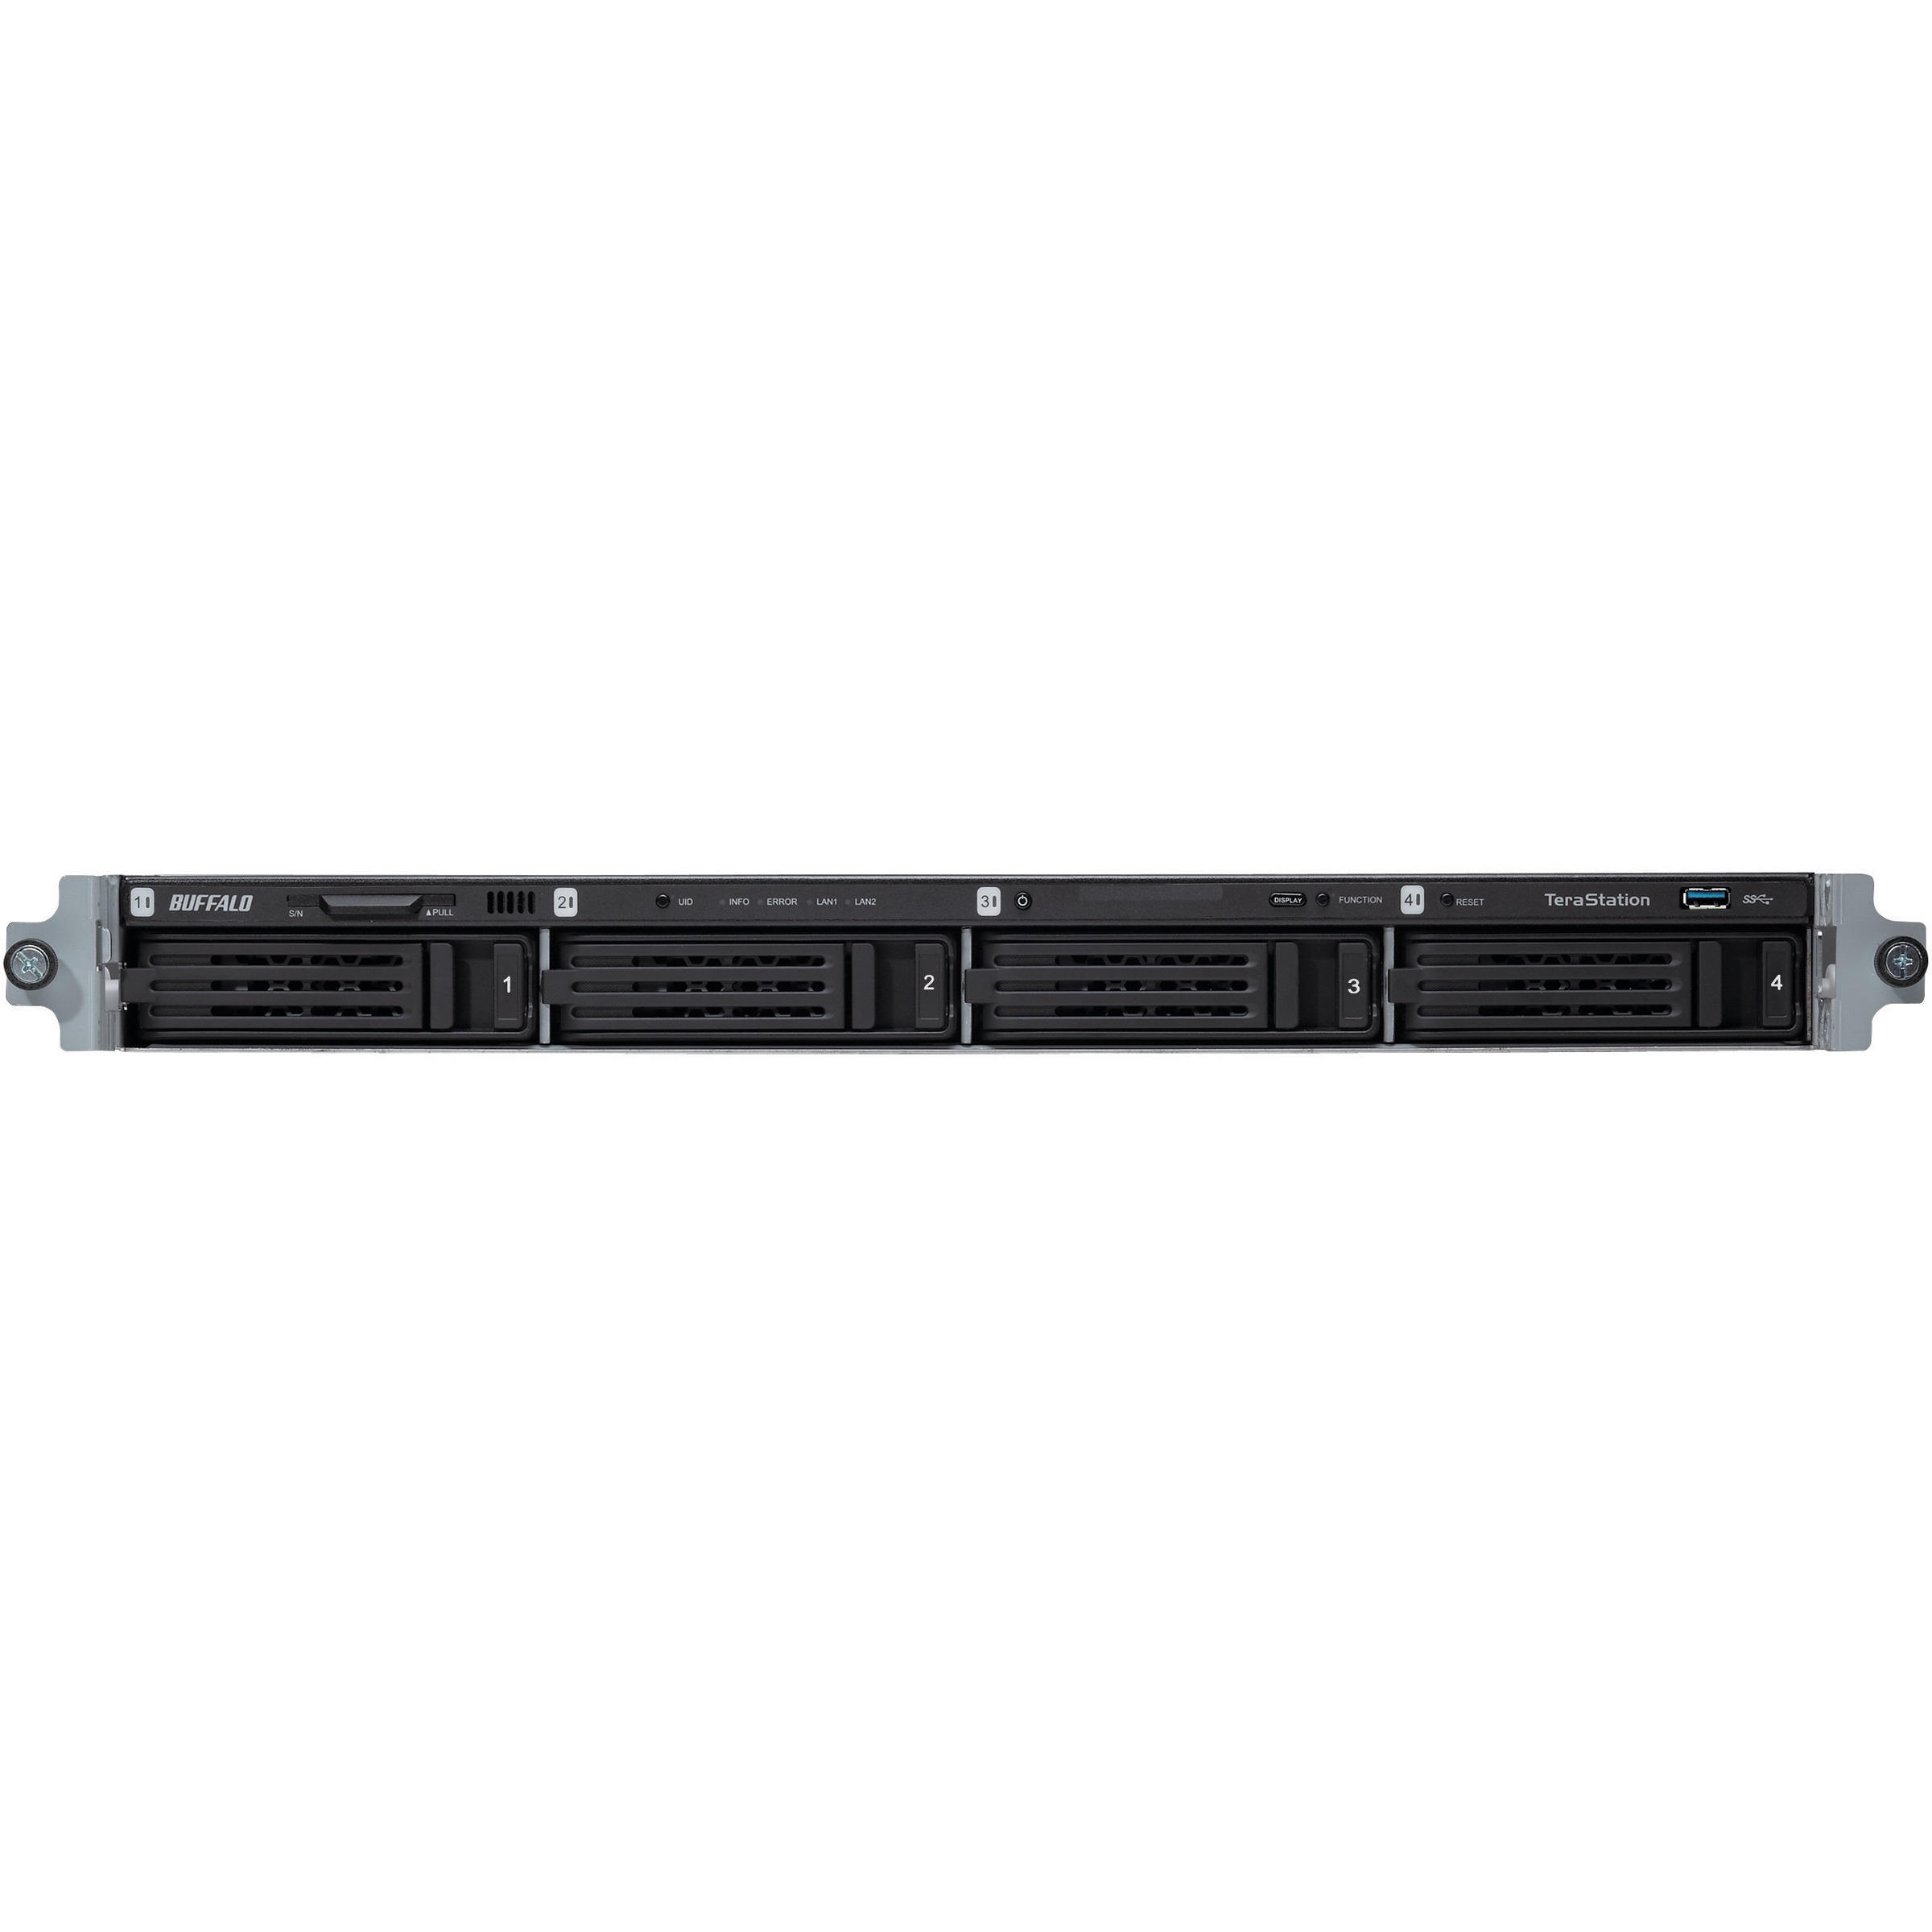 Buffalo TeraStation TS5400RWR0804 4 x Total Bays NAS Server - 1U - Rack-mountable - 1 x Intel Atom D2700 Dual-core 2 Core 2.13 GHz - 8 TB HDD 4 x 2 TB - 2 GB RAM